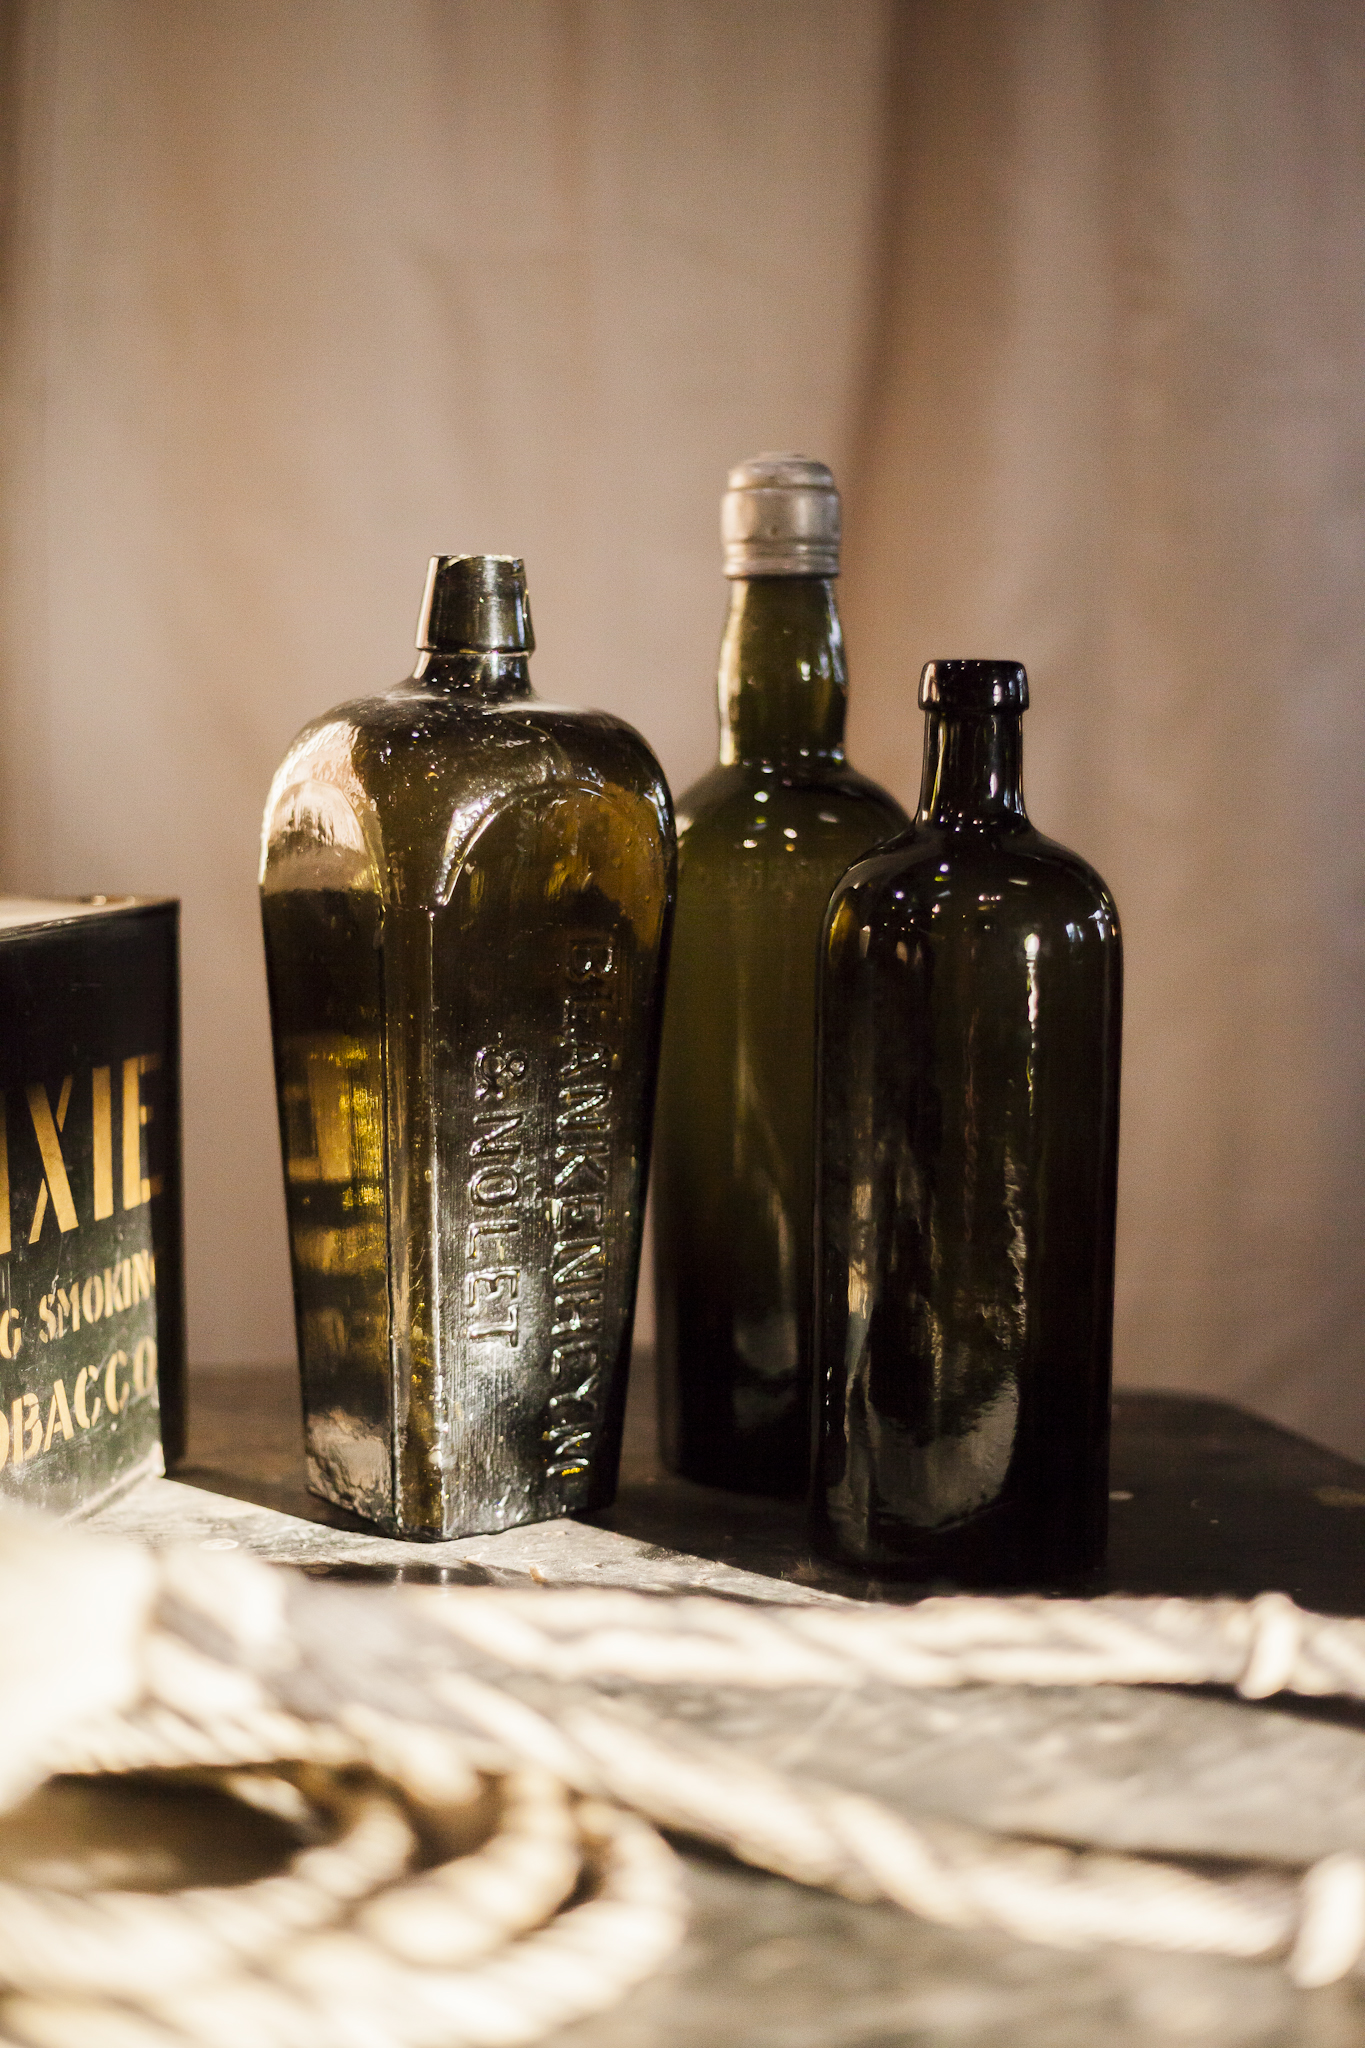 Antique Medicine, Apothecary Supplies and a Lasso